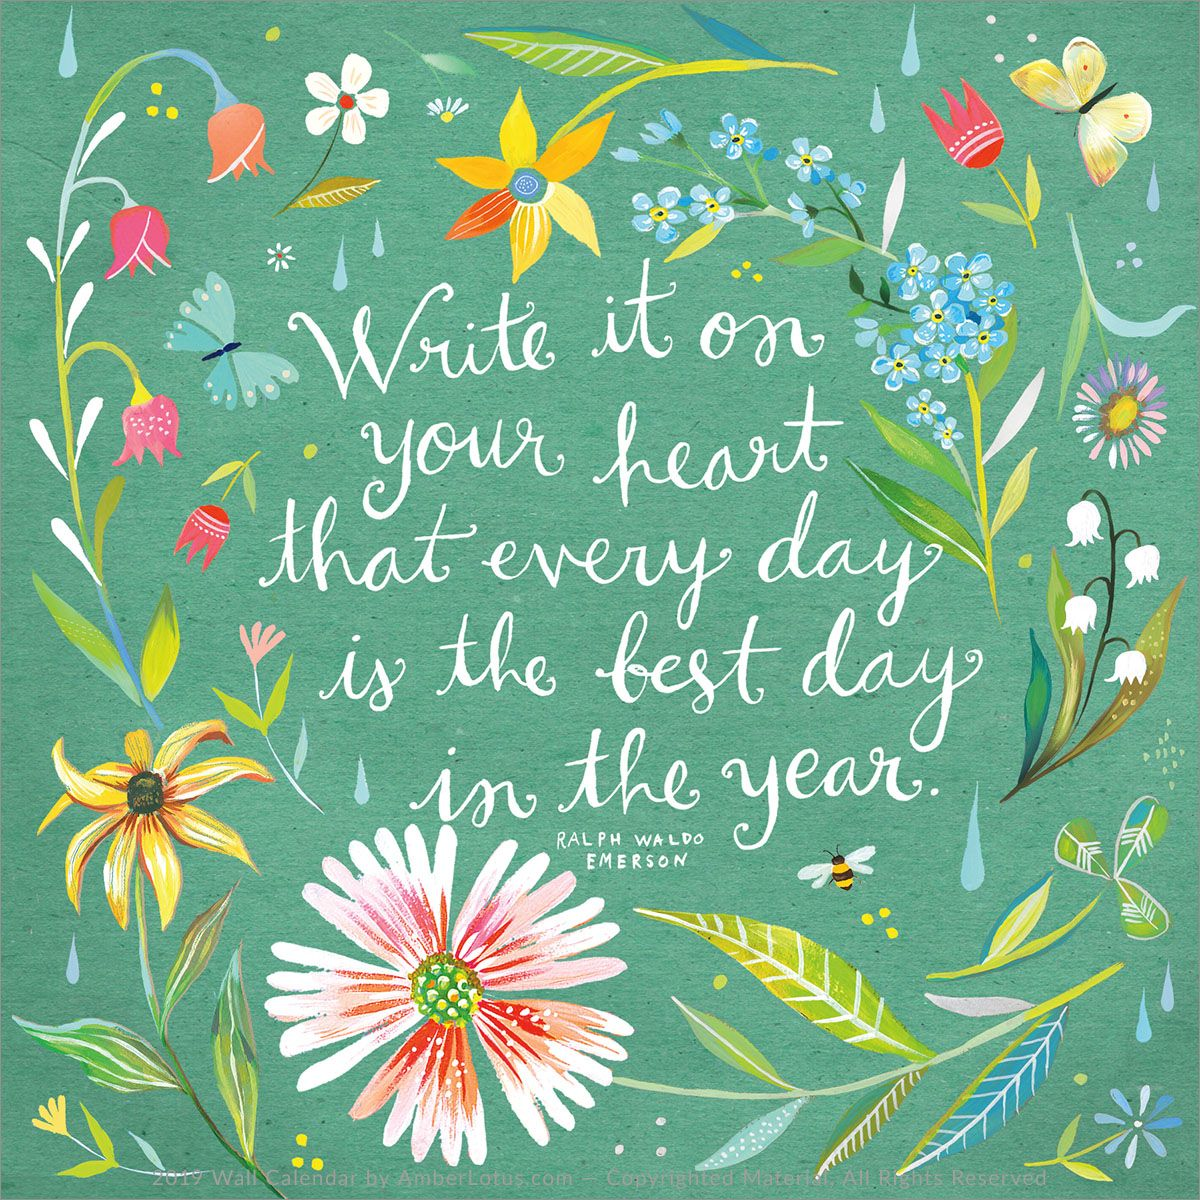 Katie Daisy 2020 Wall Calendar in 2020 World kindness